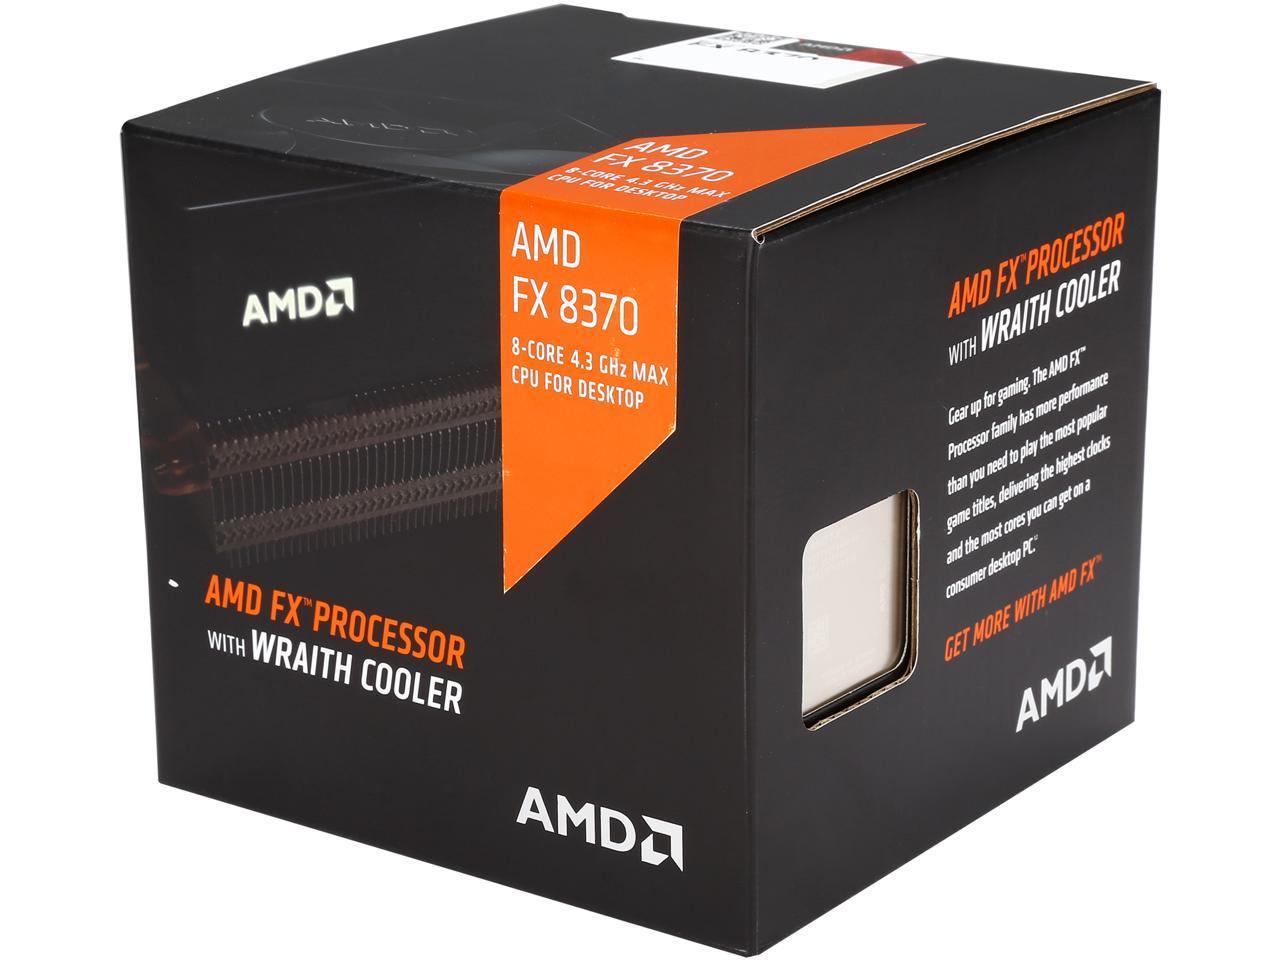 Amd Fx 8370 43ghz Am3 Desktop Processor Boxed 6300 Box